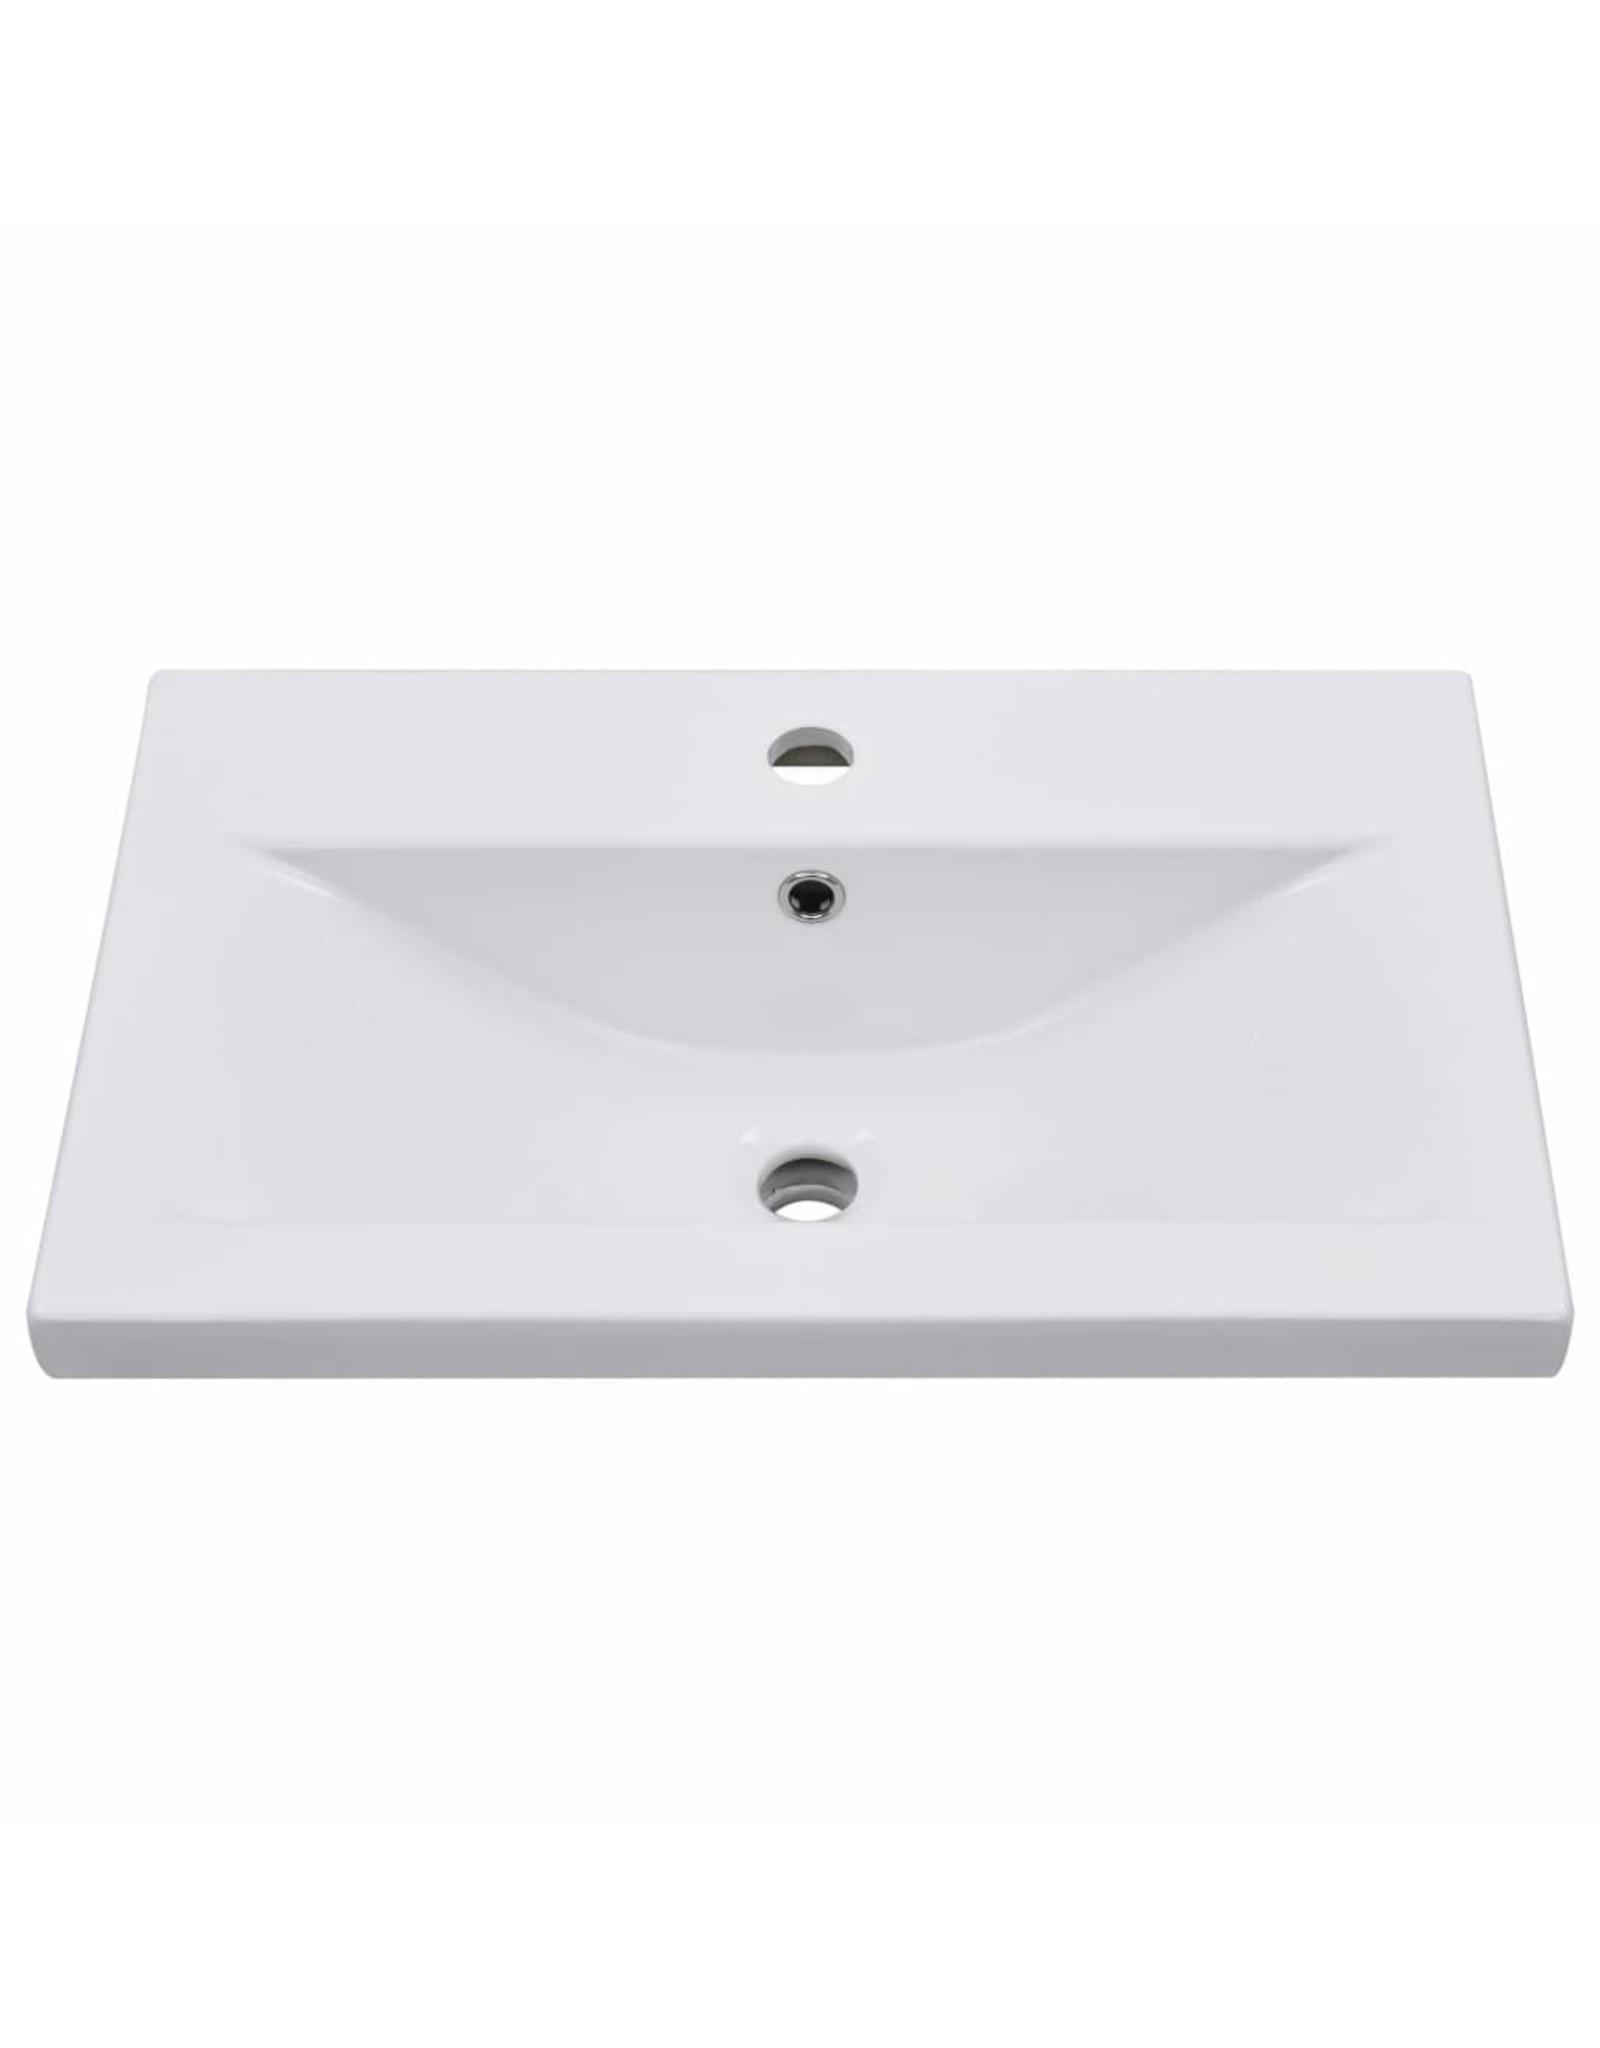 Inbouwwastafel 61x39,5x18,5 cm keramiek wit